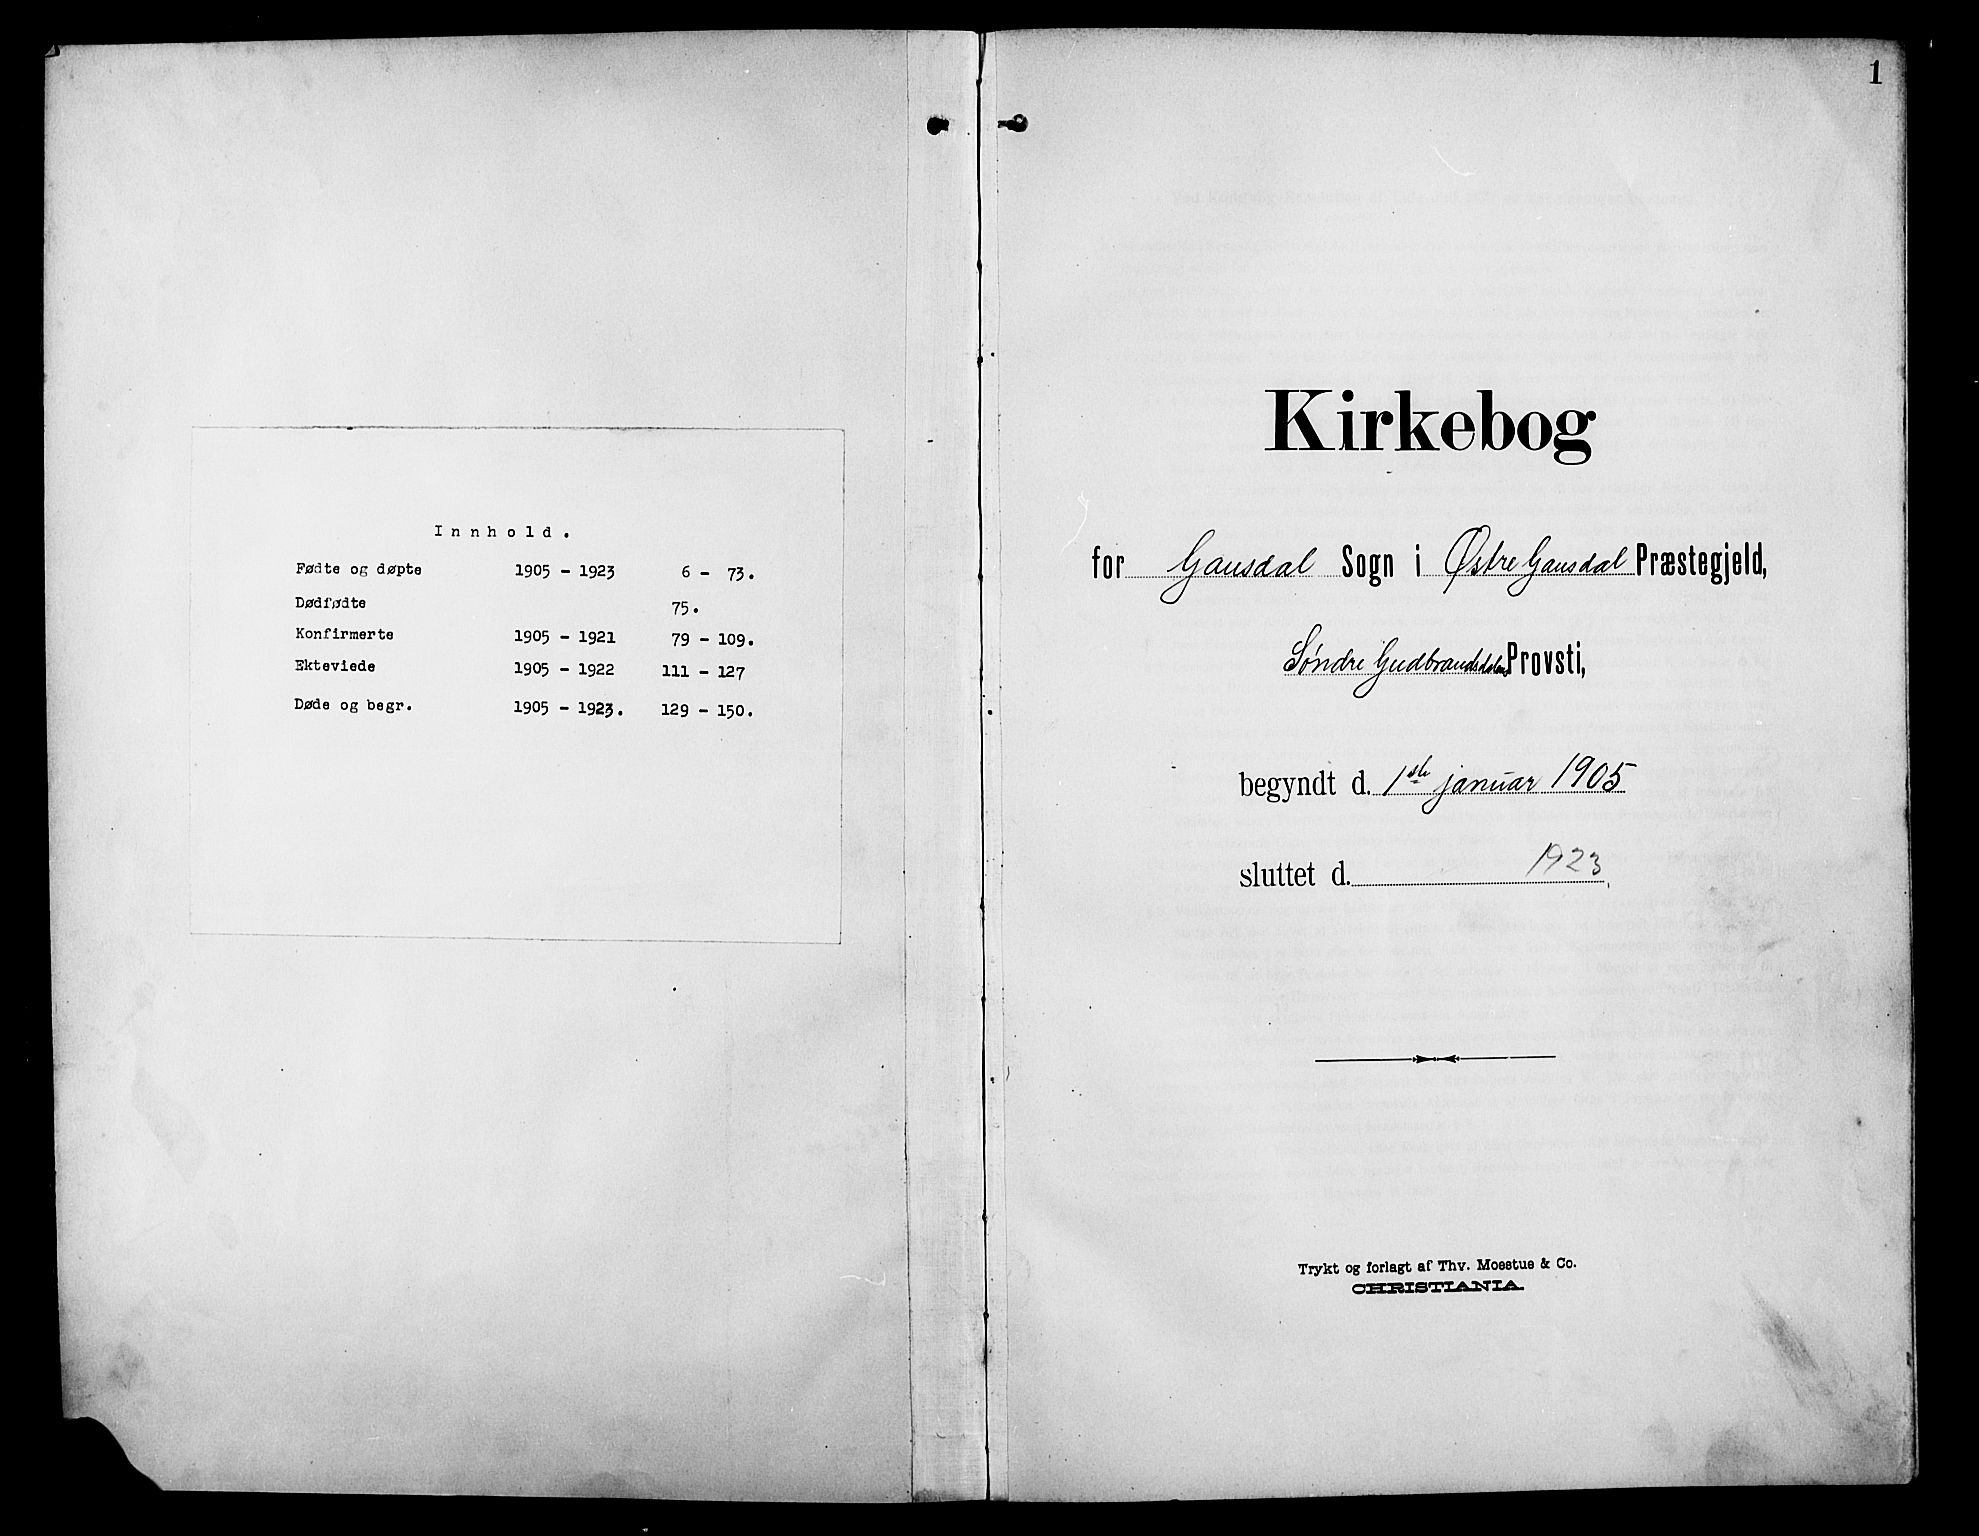 SAH, Østre Gausdal prestekontor, Klokkerbok nr. 4, 1905-1923, s. 1